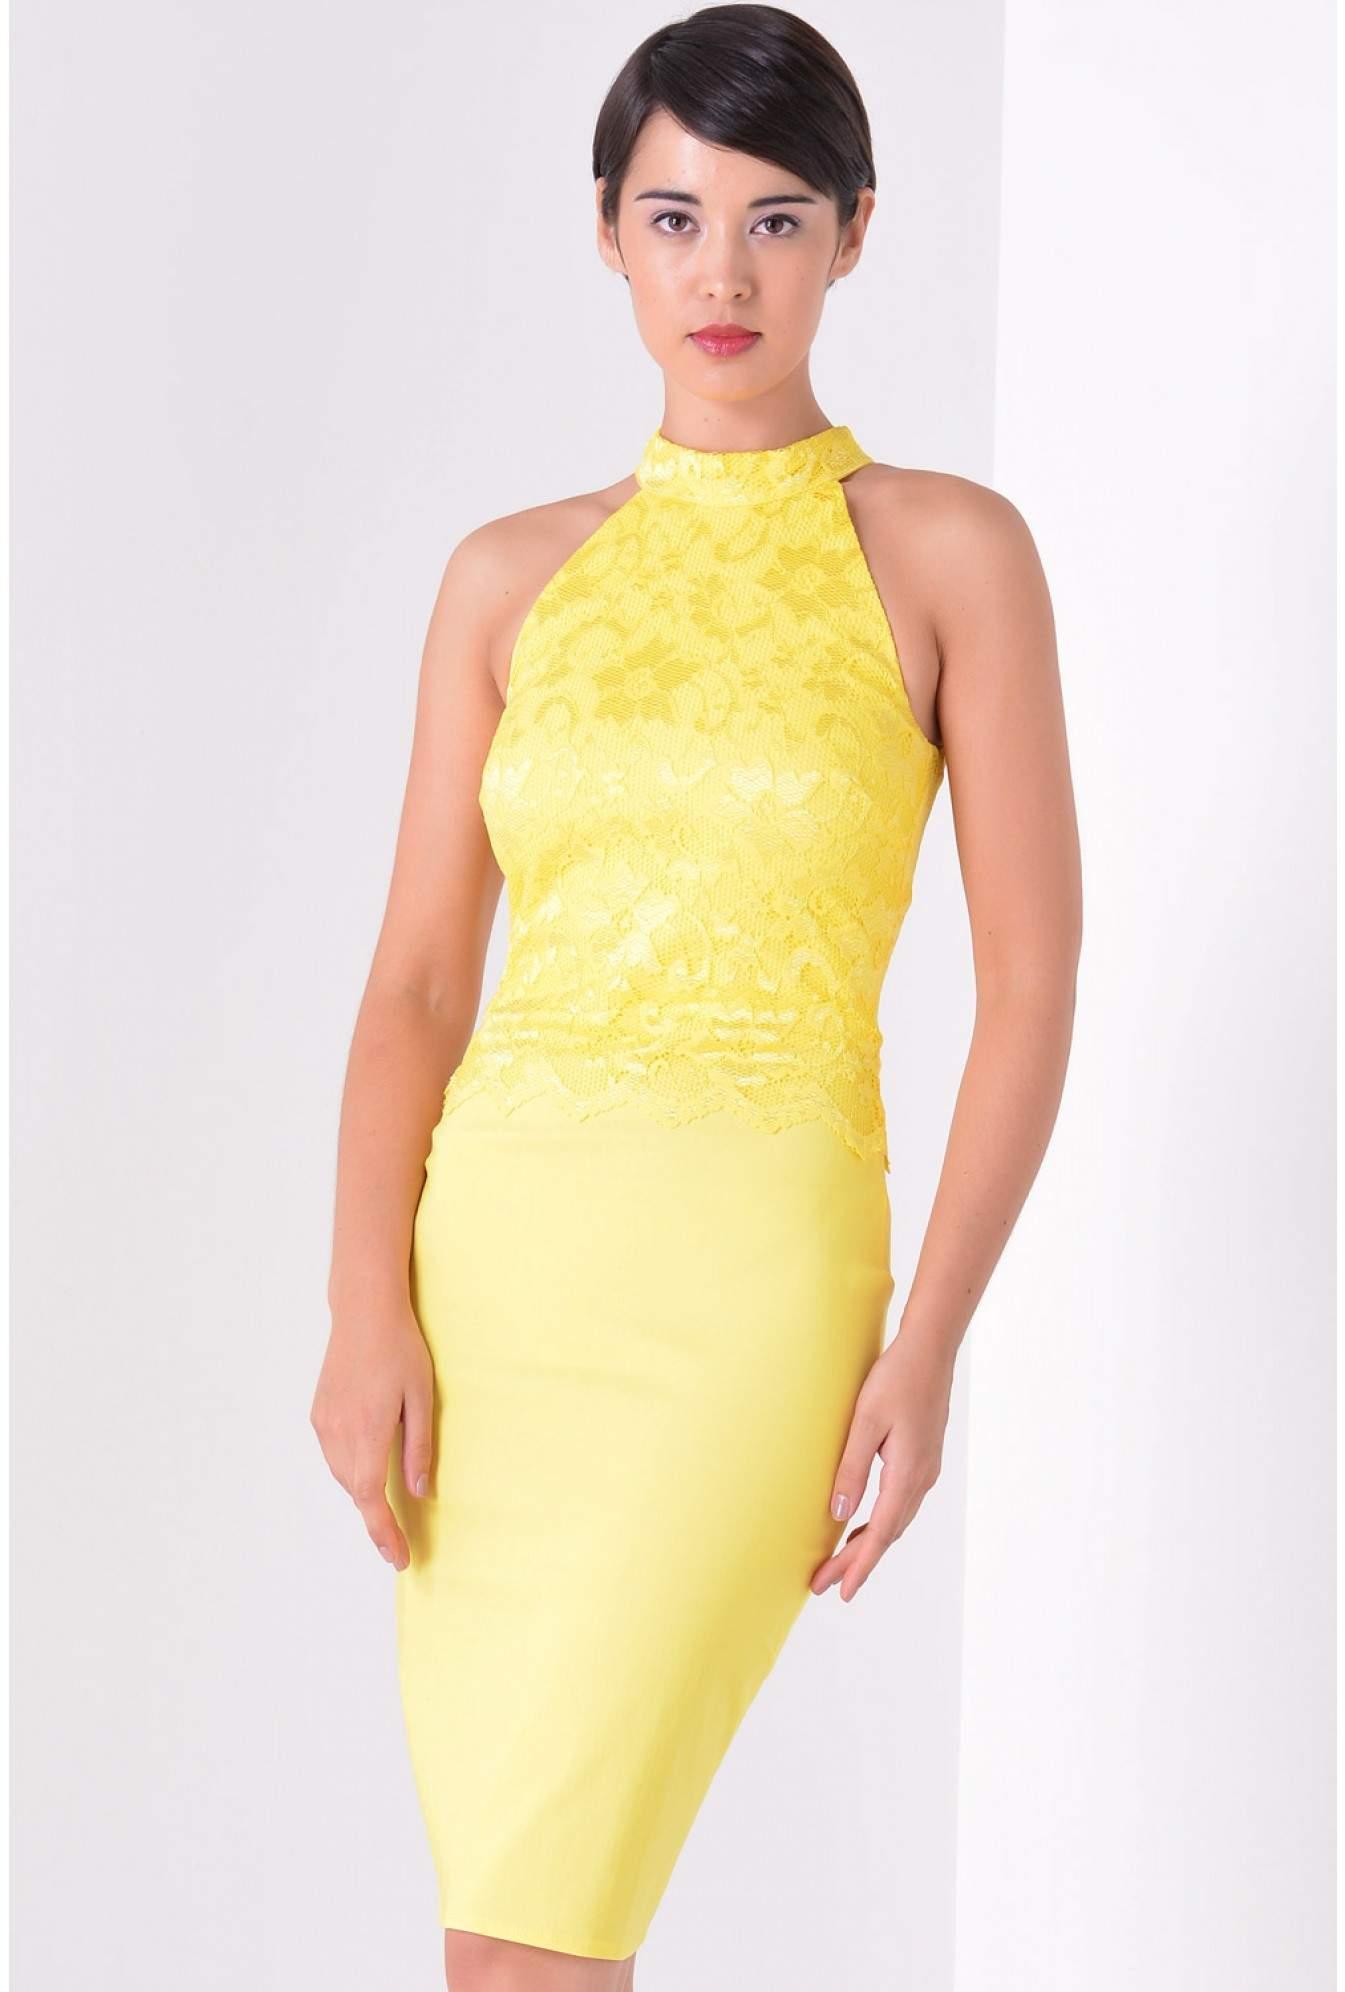 d7efdafc Goddiva Tania Lace Panel Halter Dress in Yellow | iCLOTHING